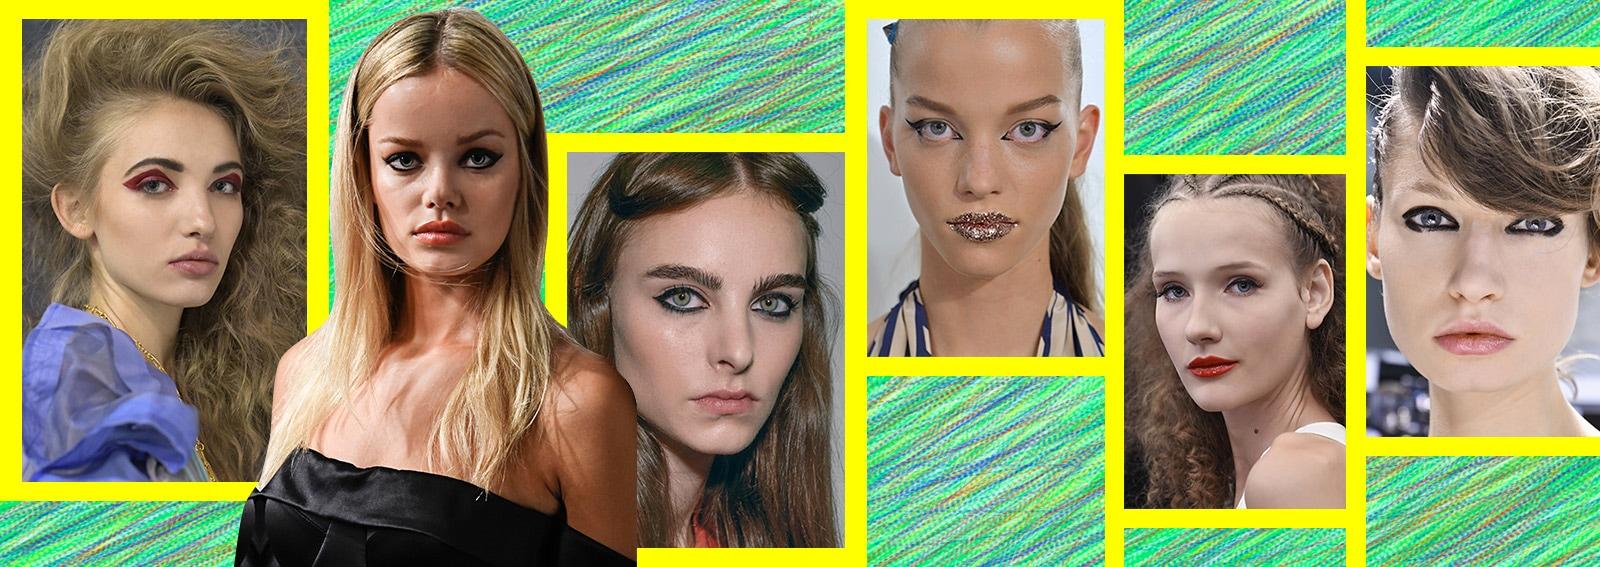 Eyeliner tendenza trucco primavera estate 2017  collage_desktop